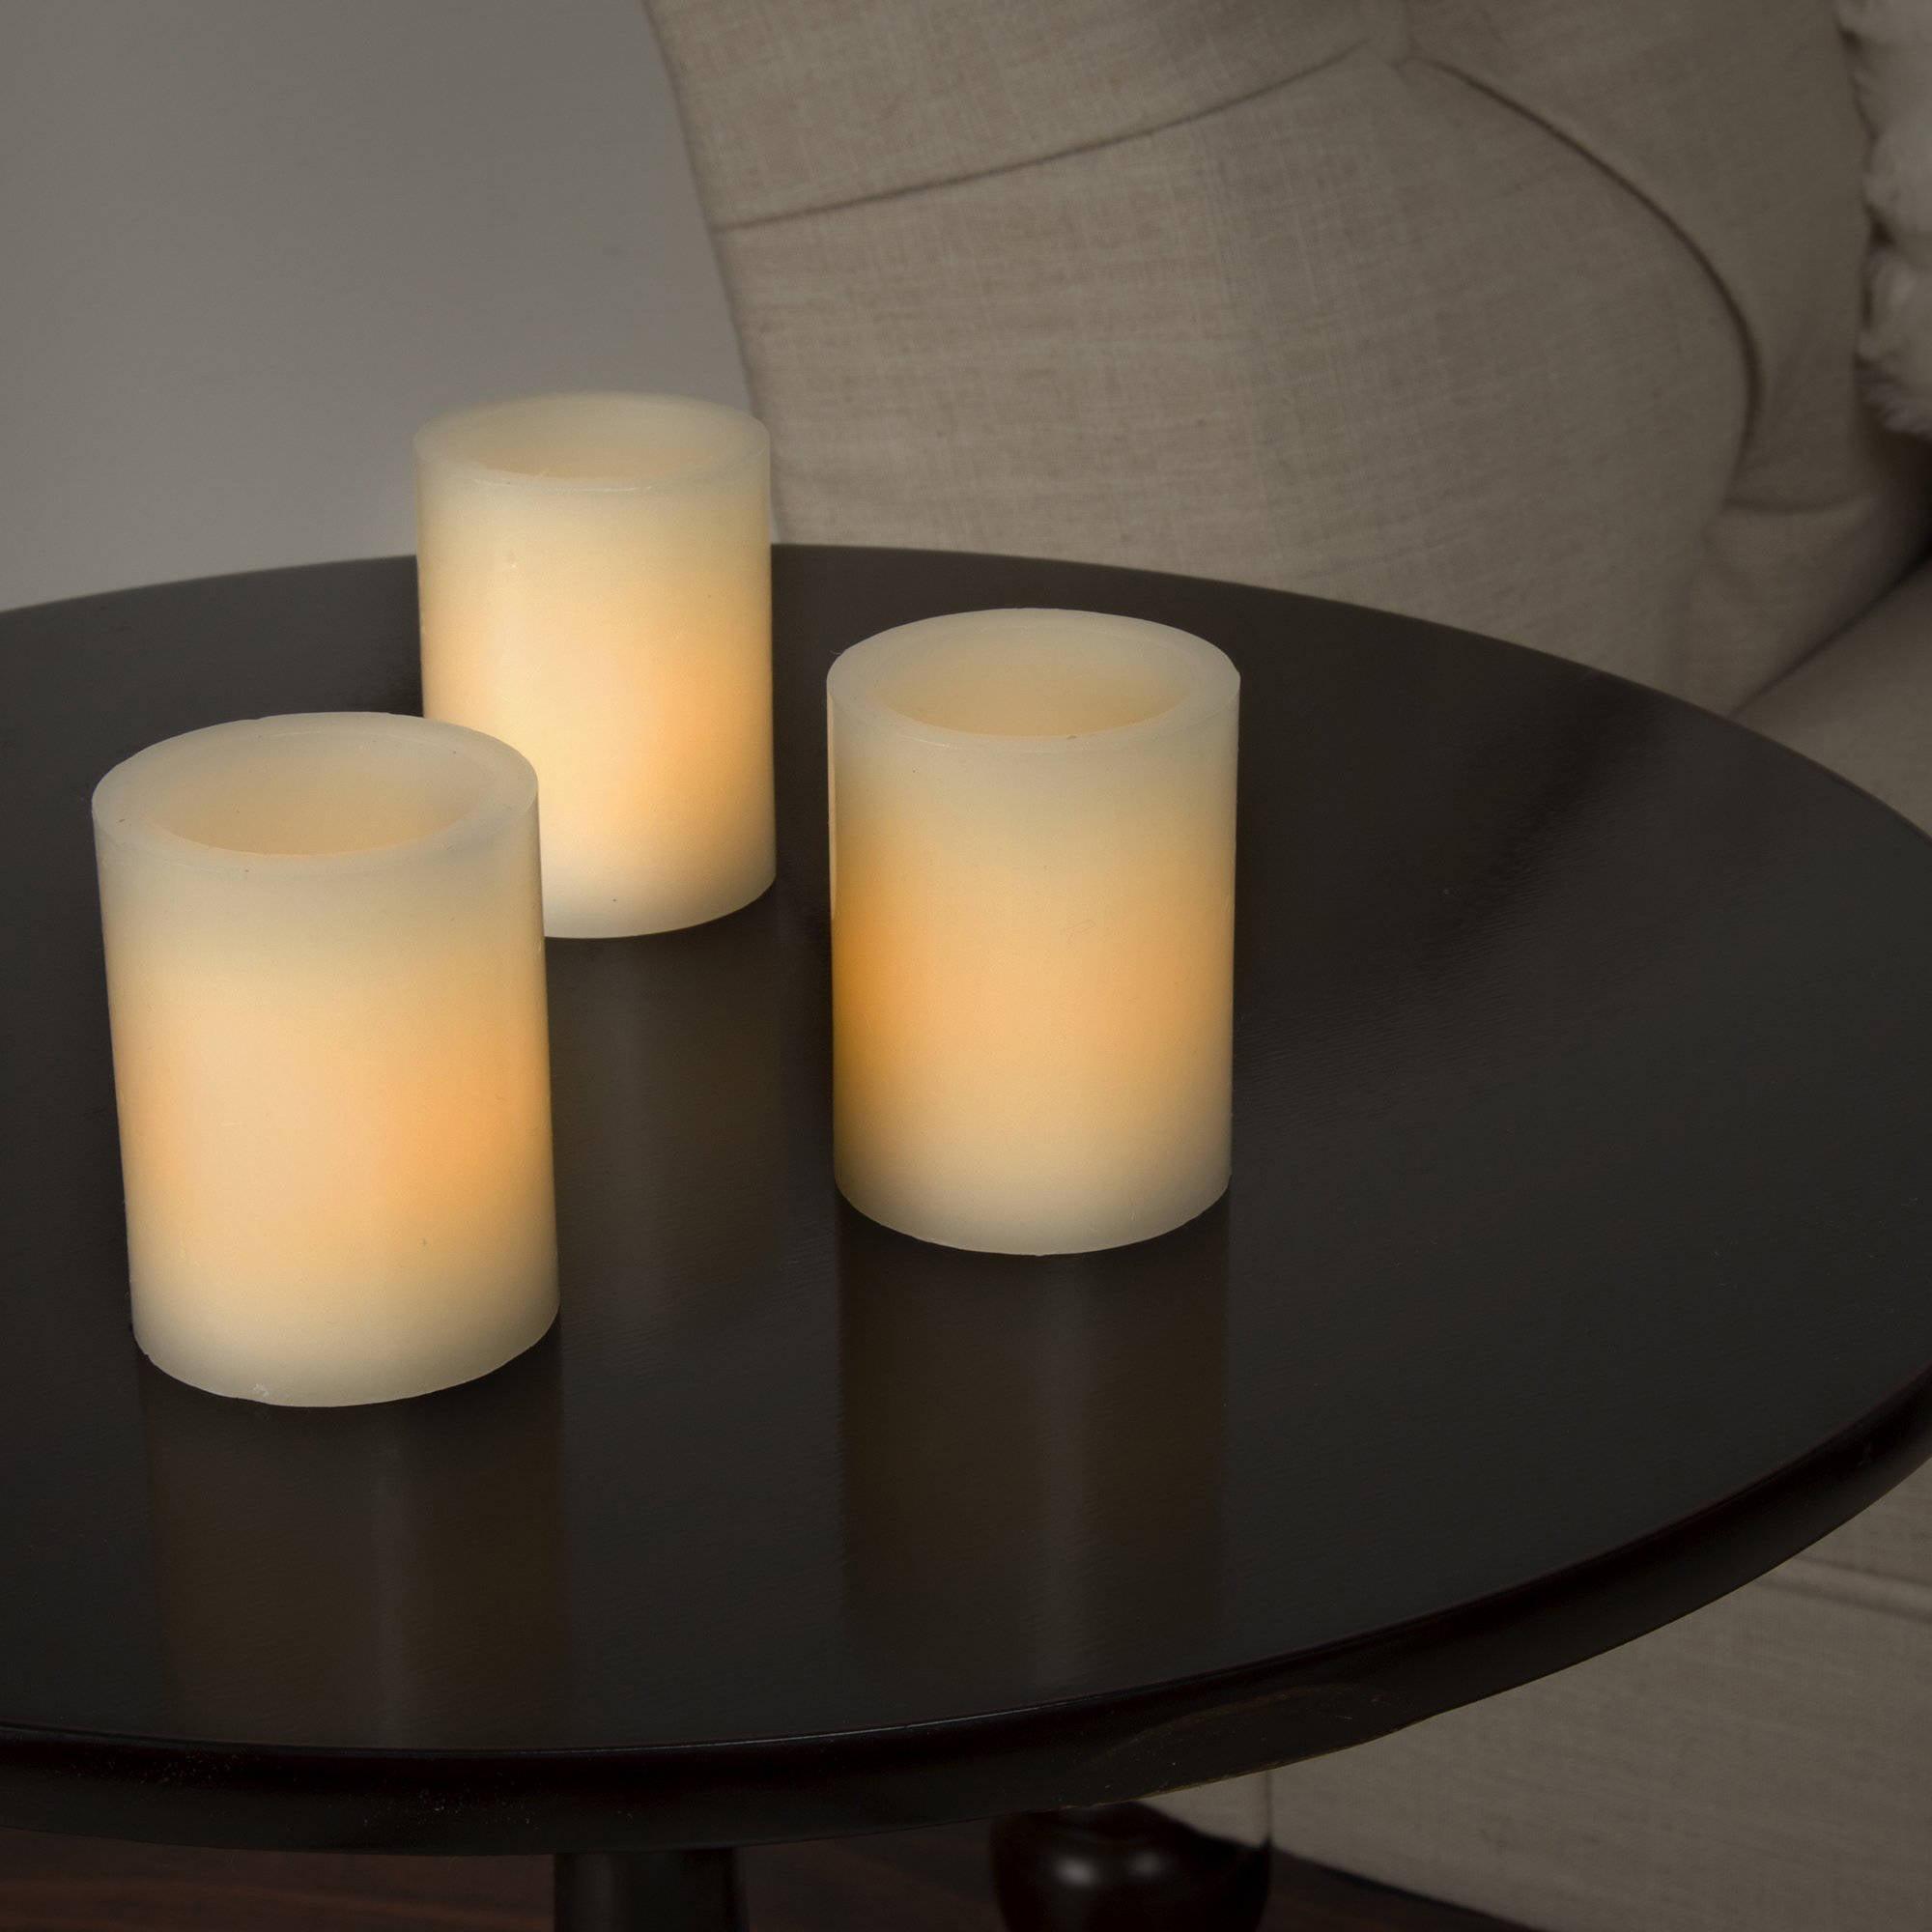 Lavish Home 8-Piece LED Votive Flameless Wax Candle Set